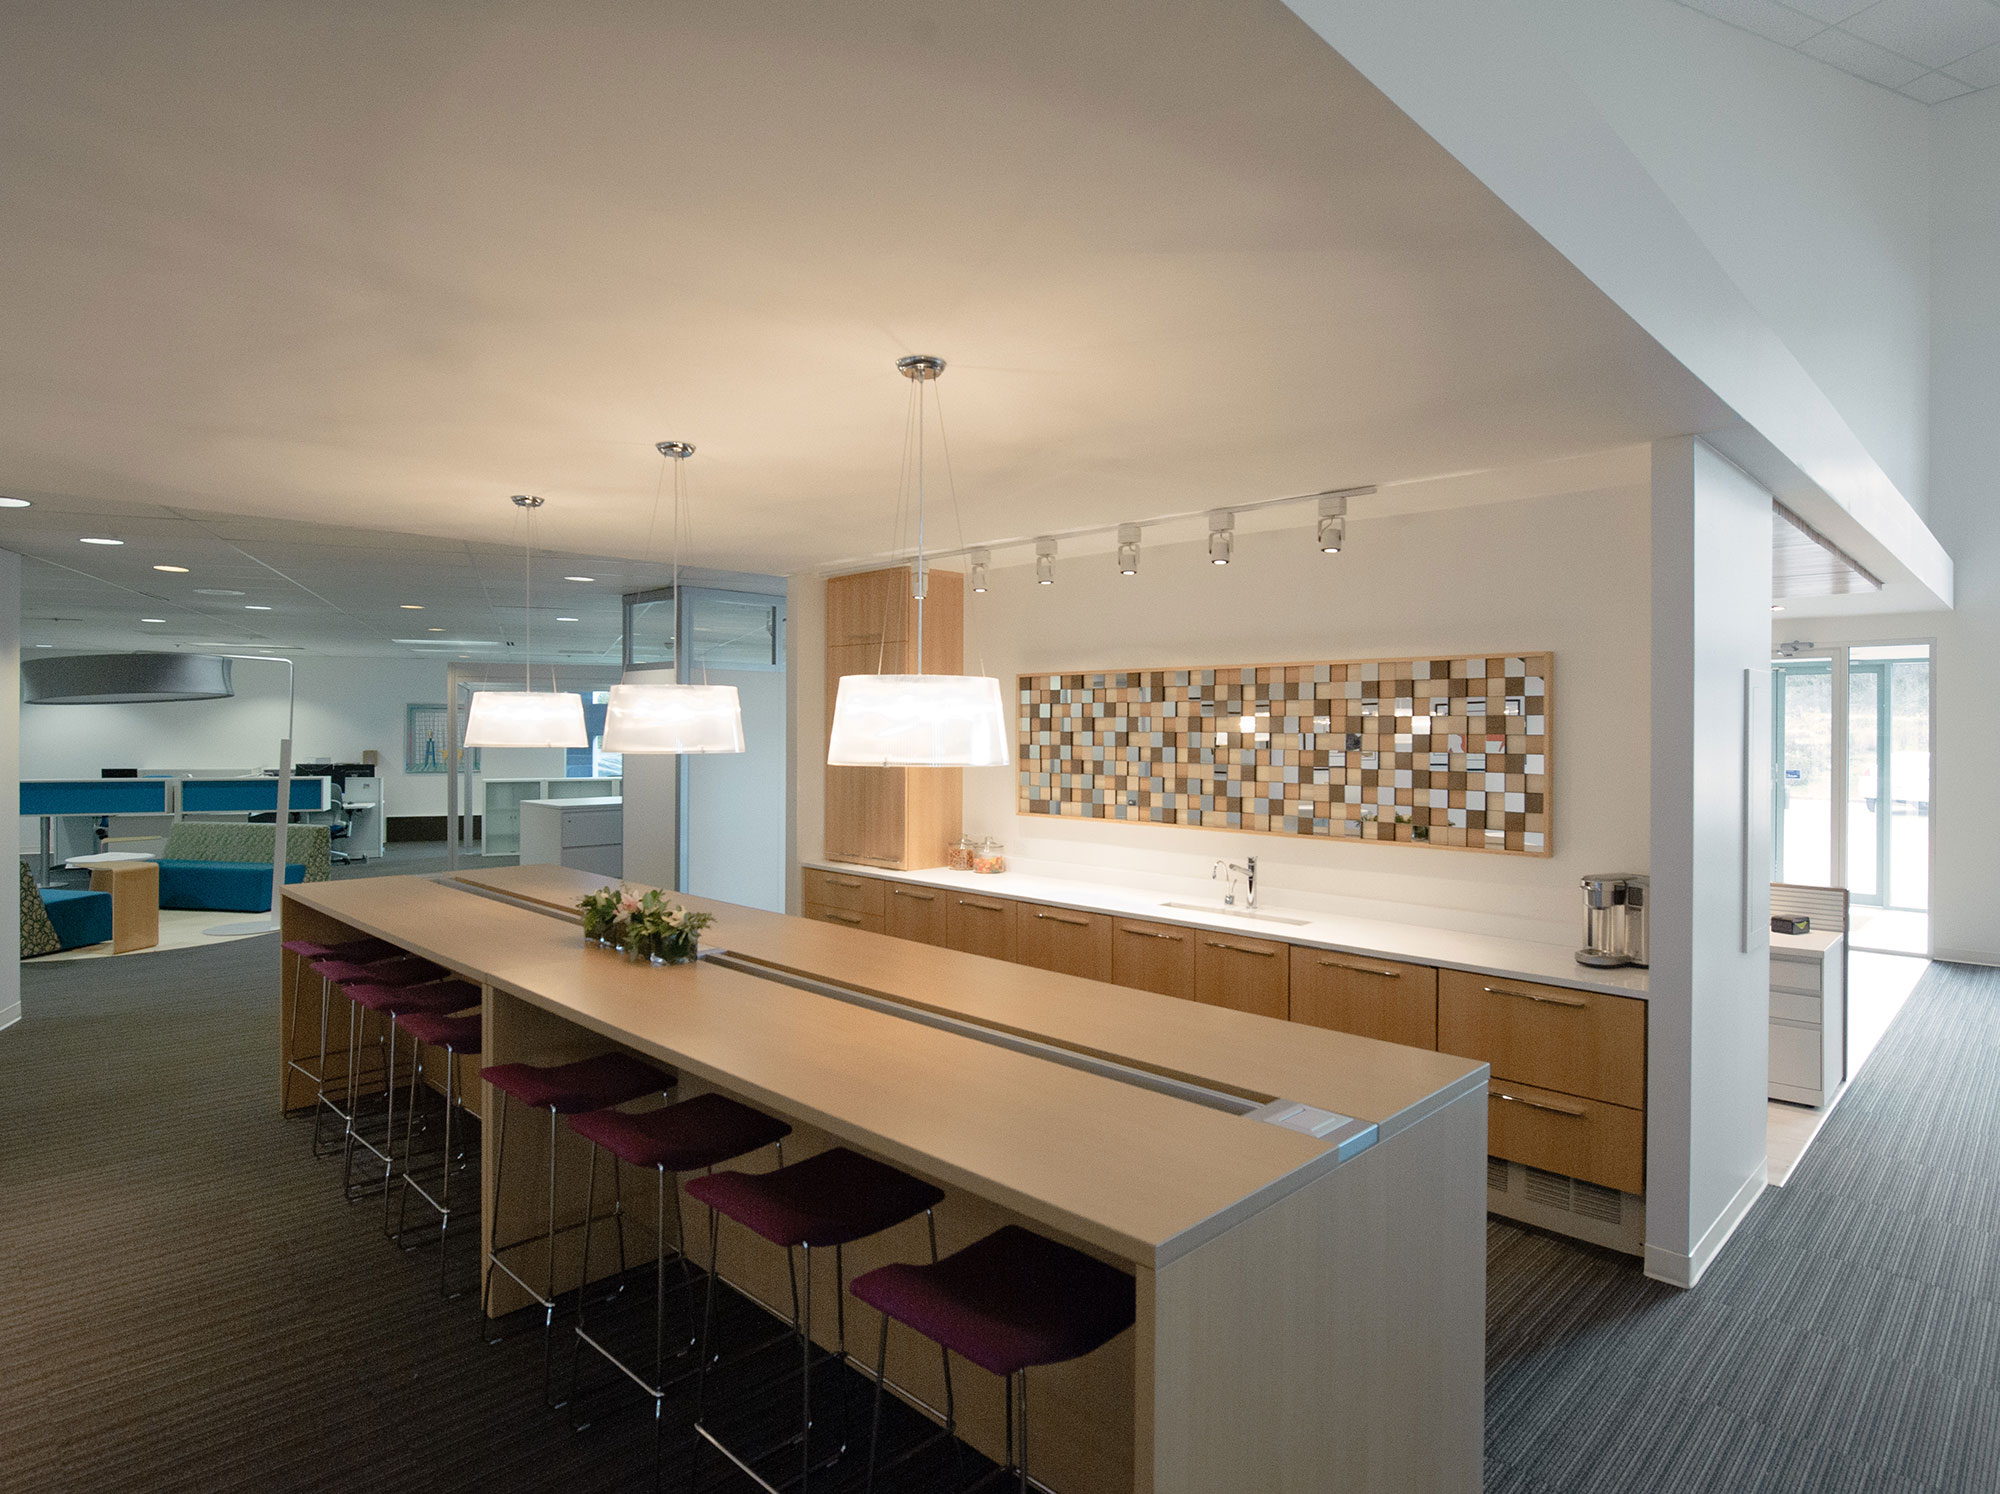 interior-design-furniture-showroom-kitchen-seating.jpg